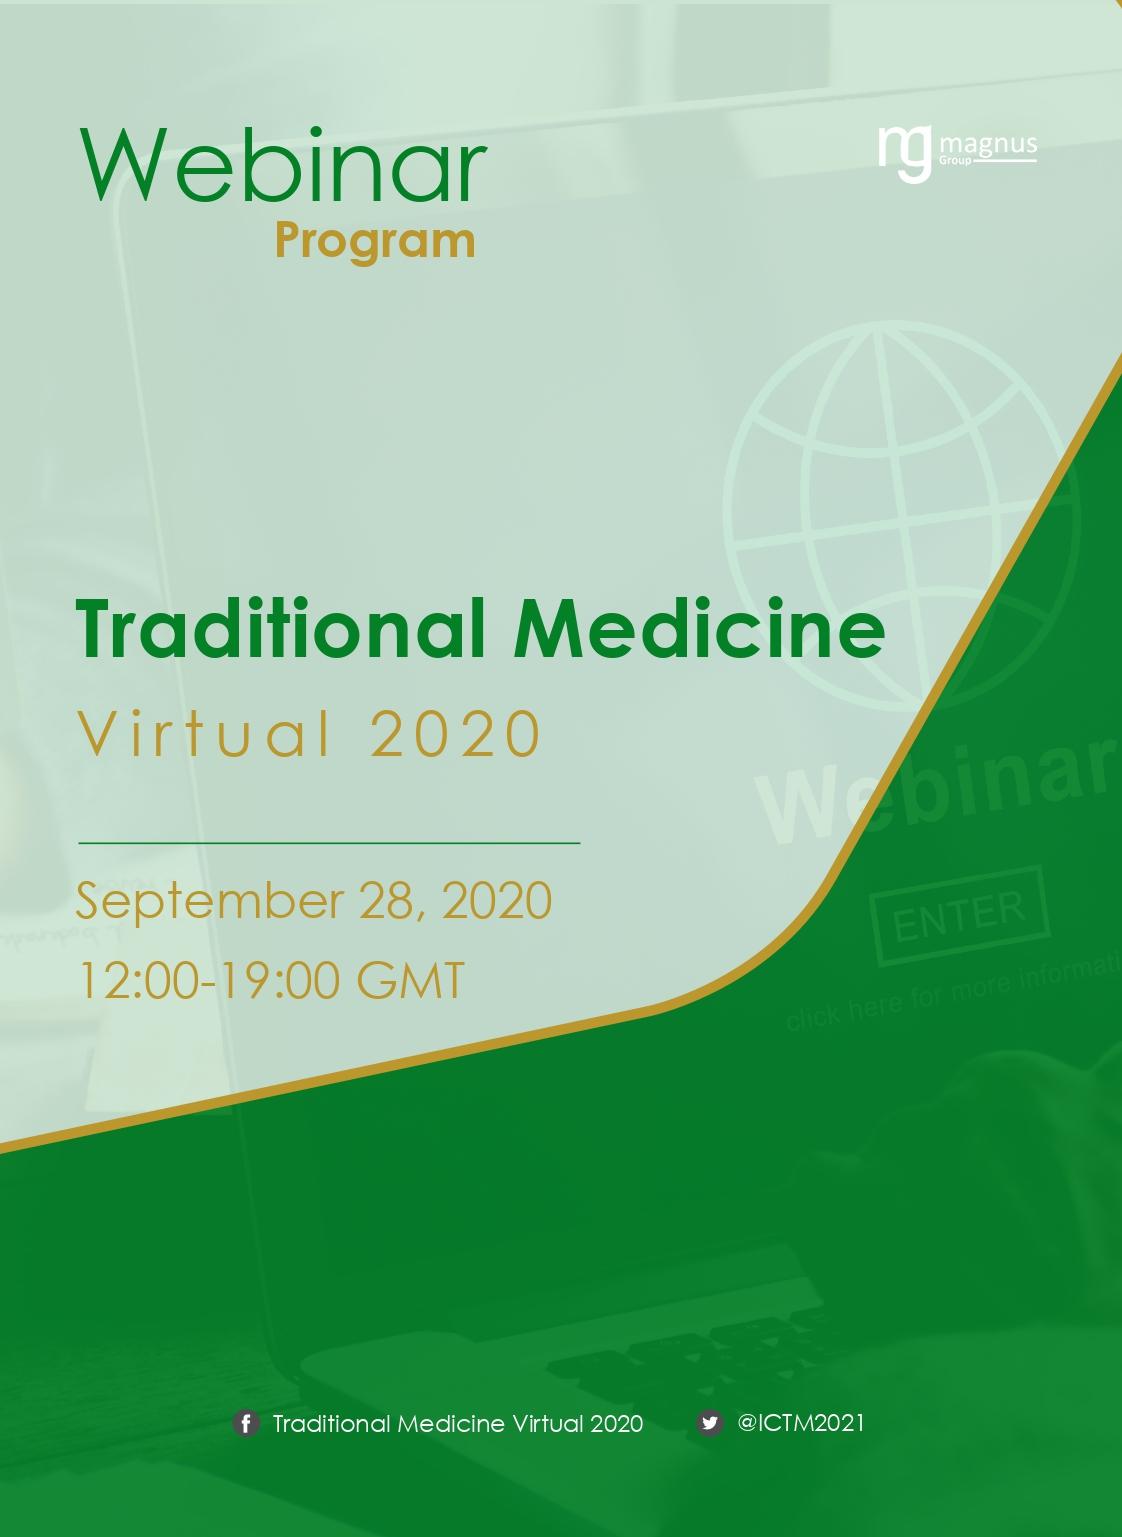 International Webinar on Traditional Medicine, Ethnomedicine and Natural Therapies | Online Event Program